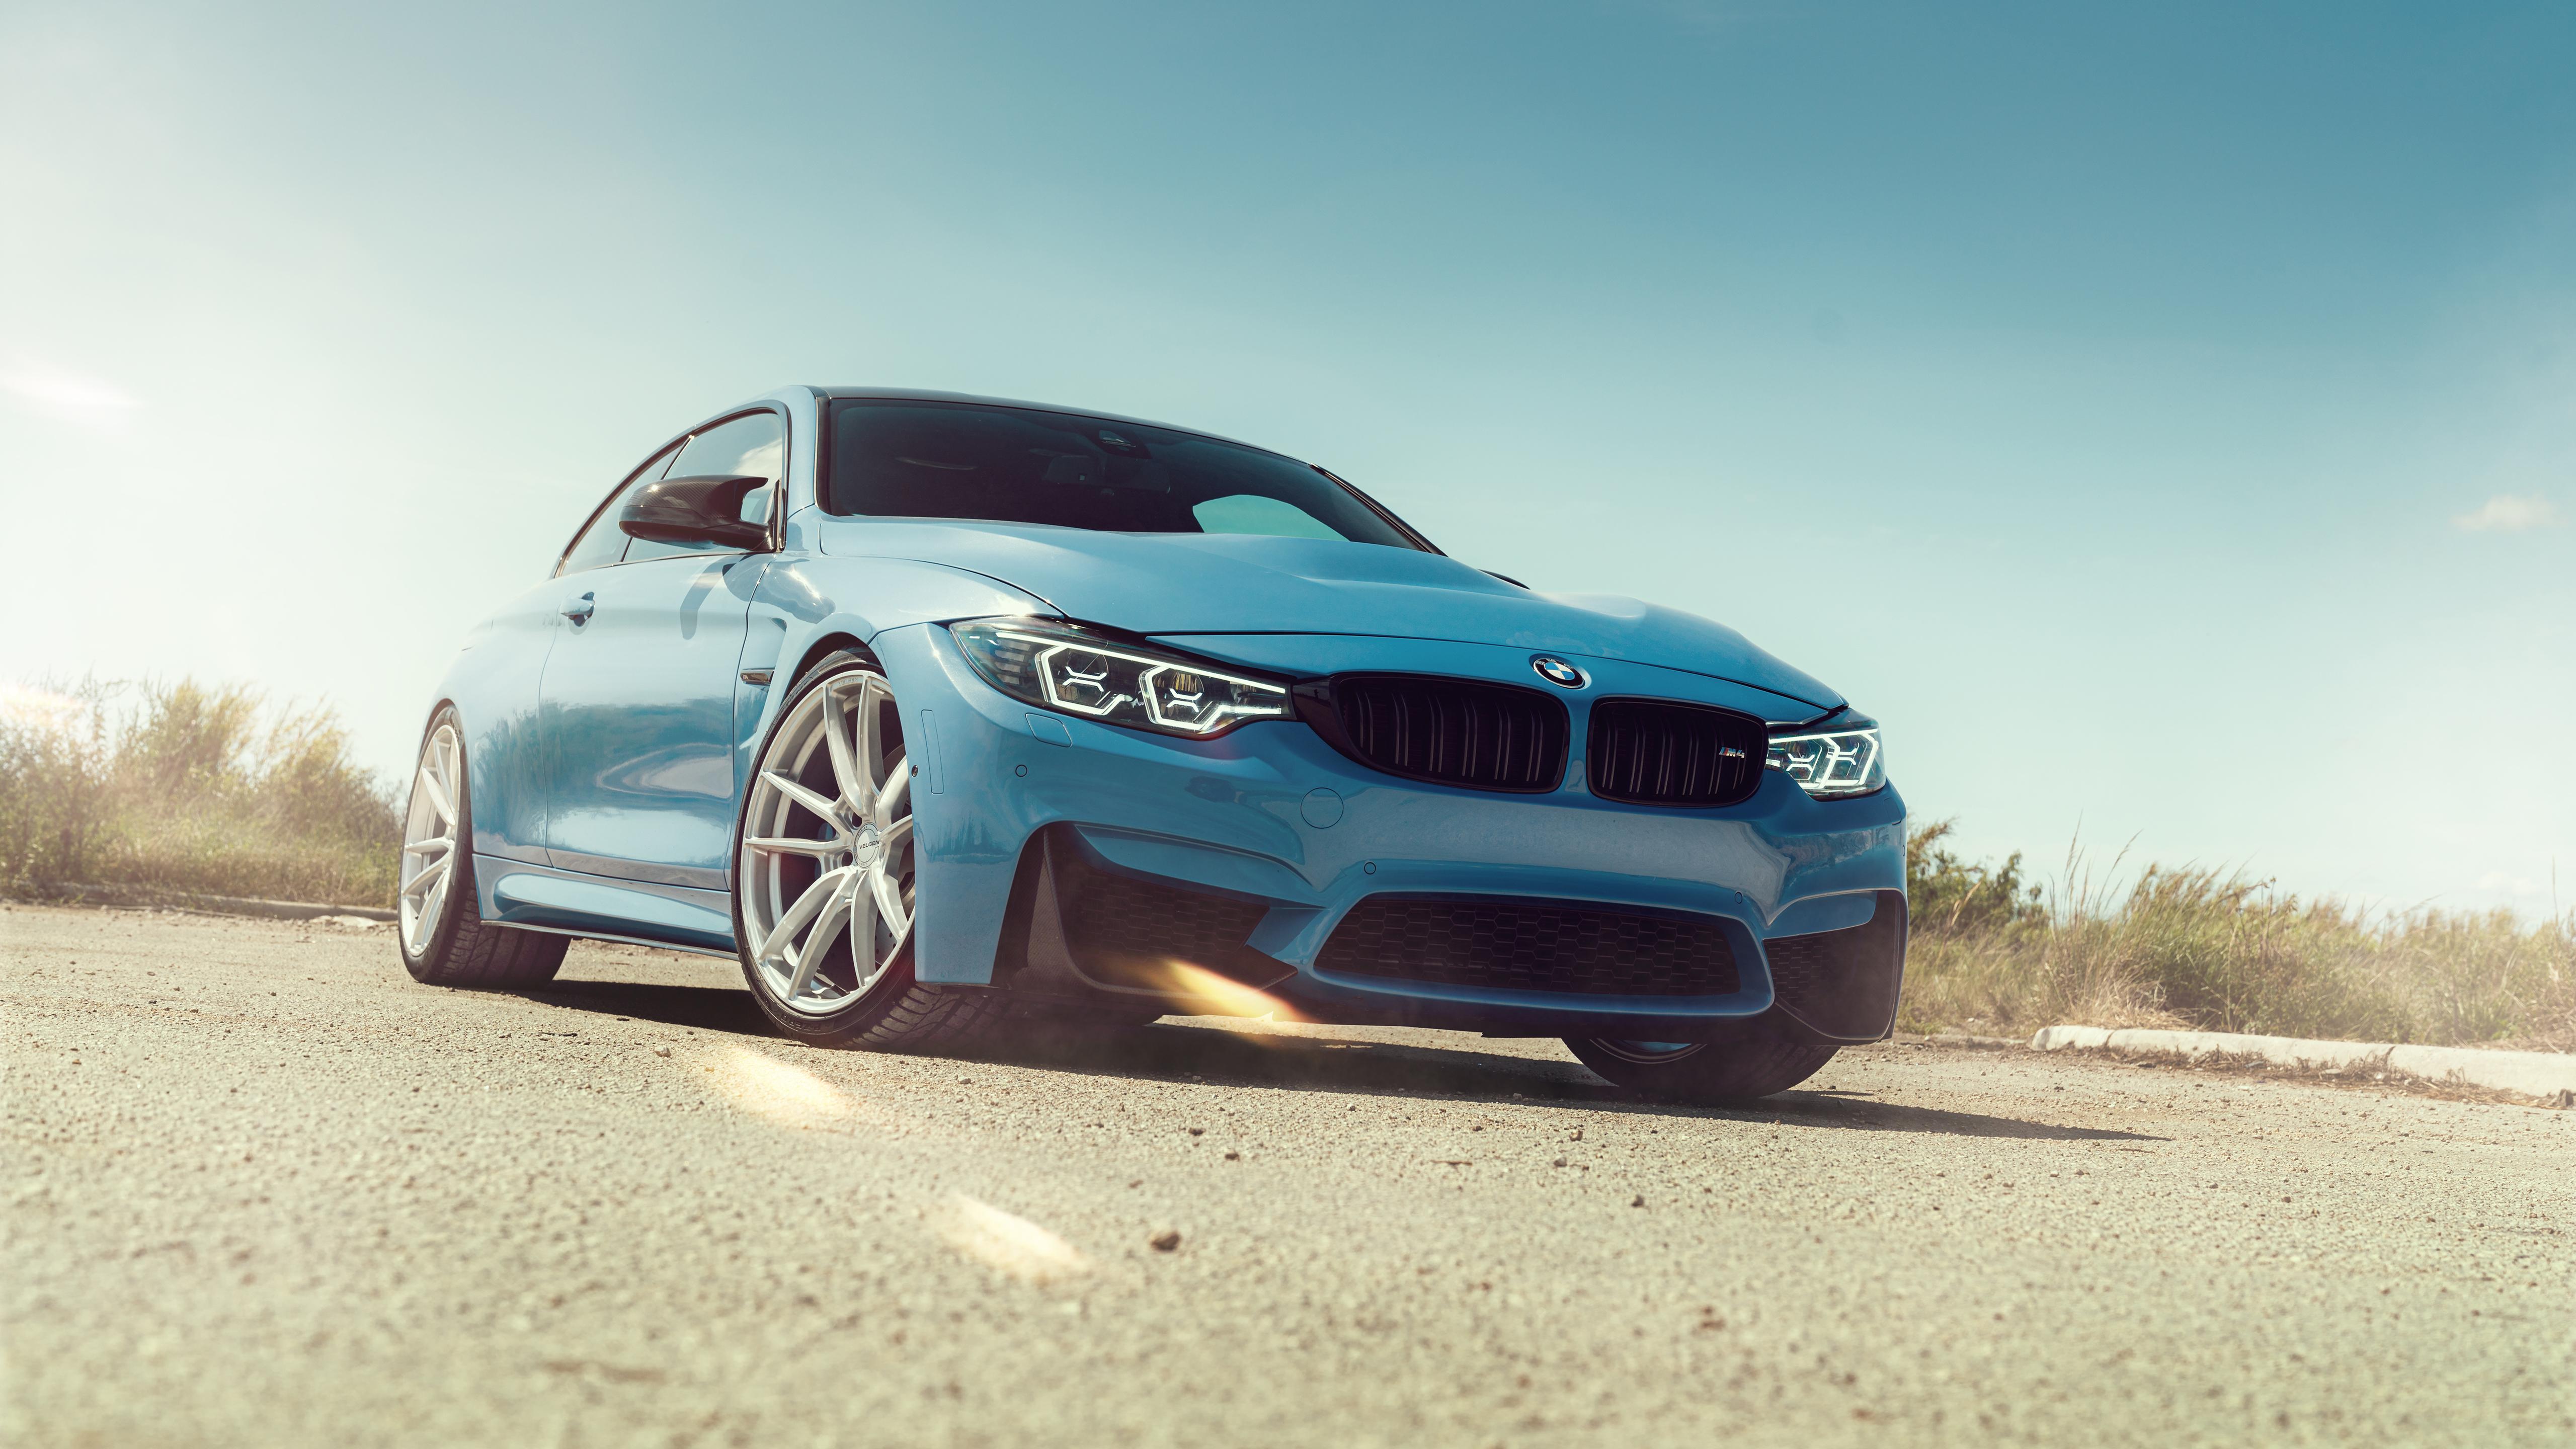 Wallpaper : BMW M4, car, vehicle, blue cars, glare, dirt ...